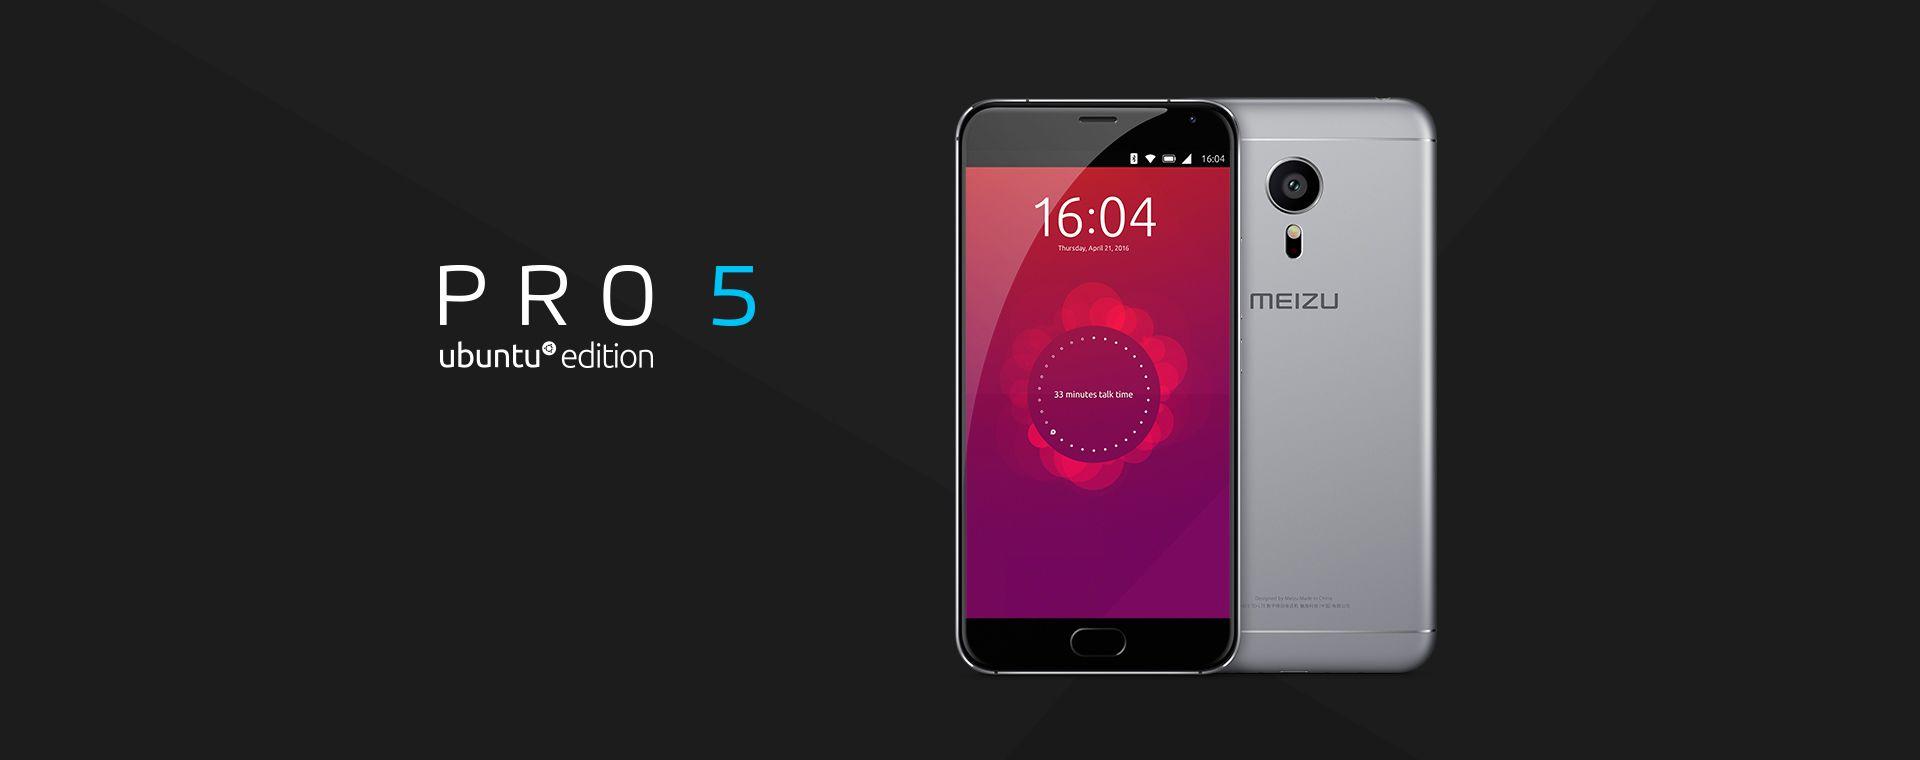 Meizu Pro 5 Ubuntu Editionを発表。プレオーダーが開始